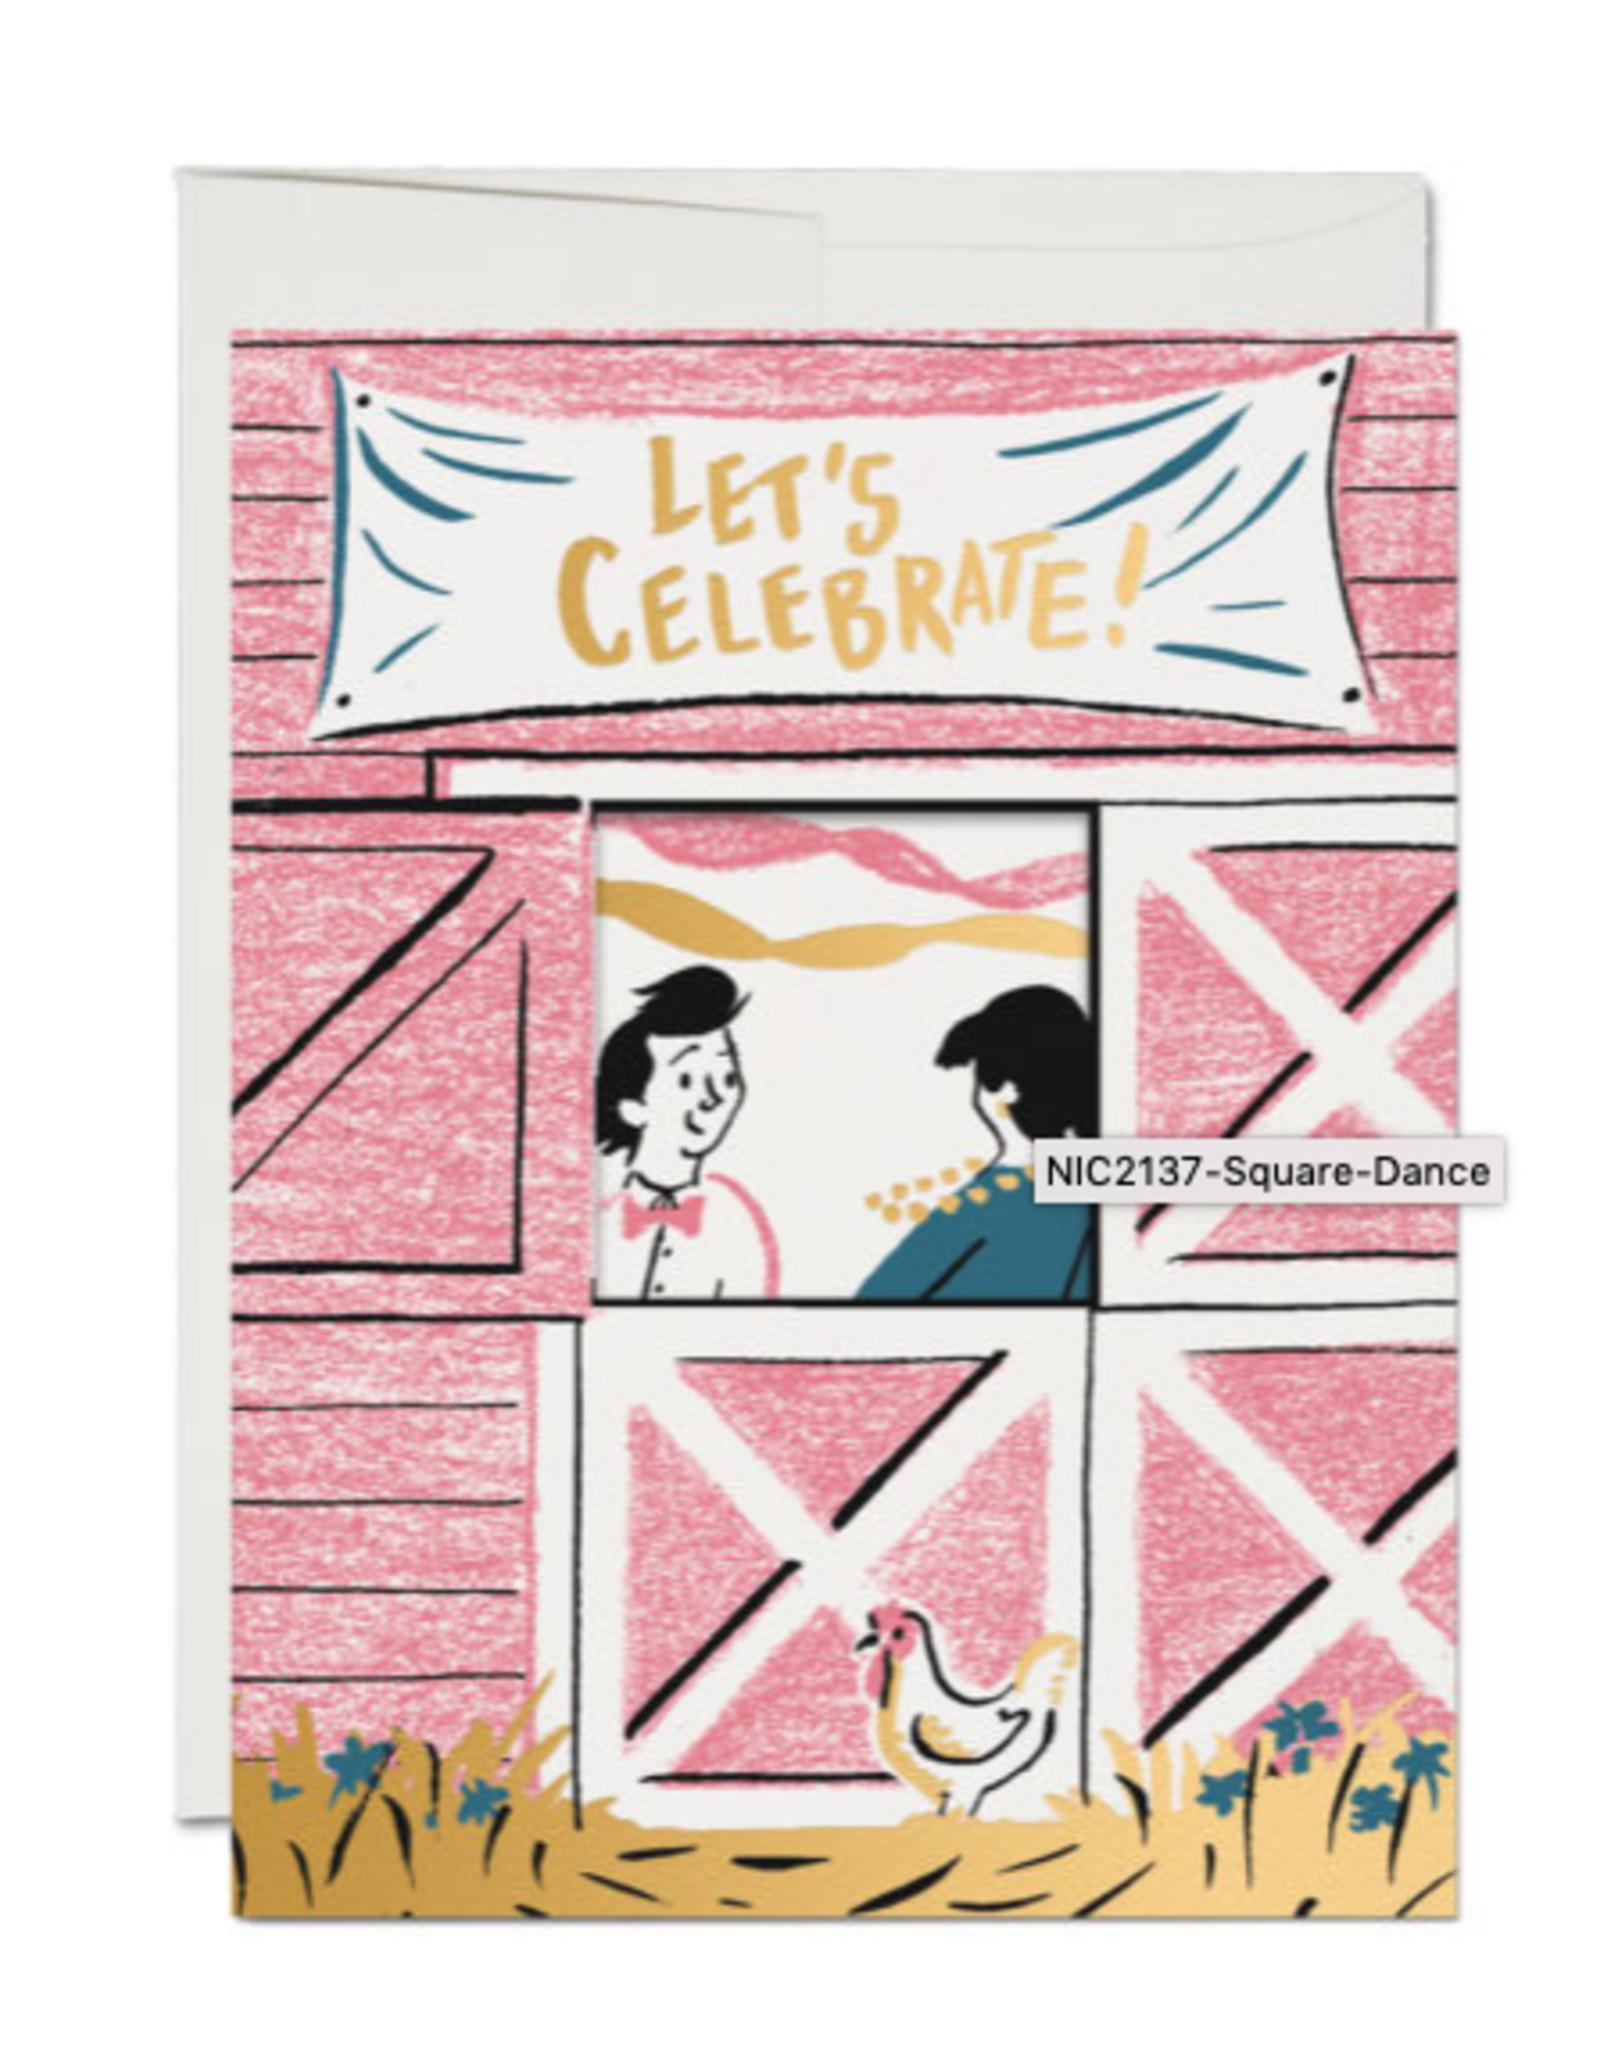 Let's Celebrate! Square Dancing Greeting Card